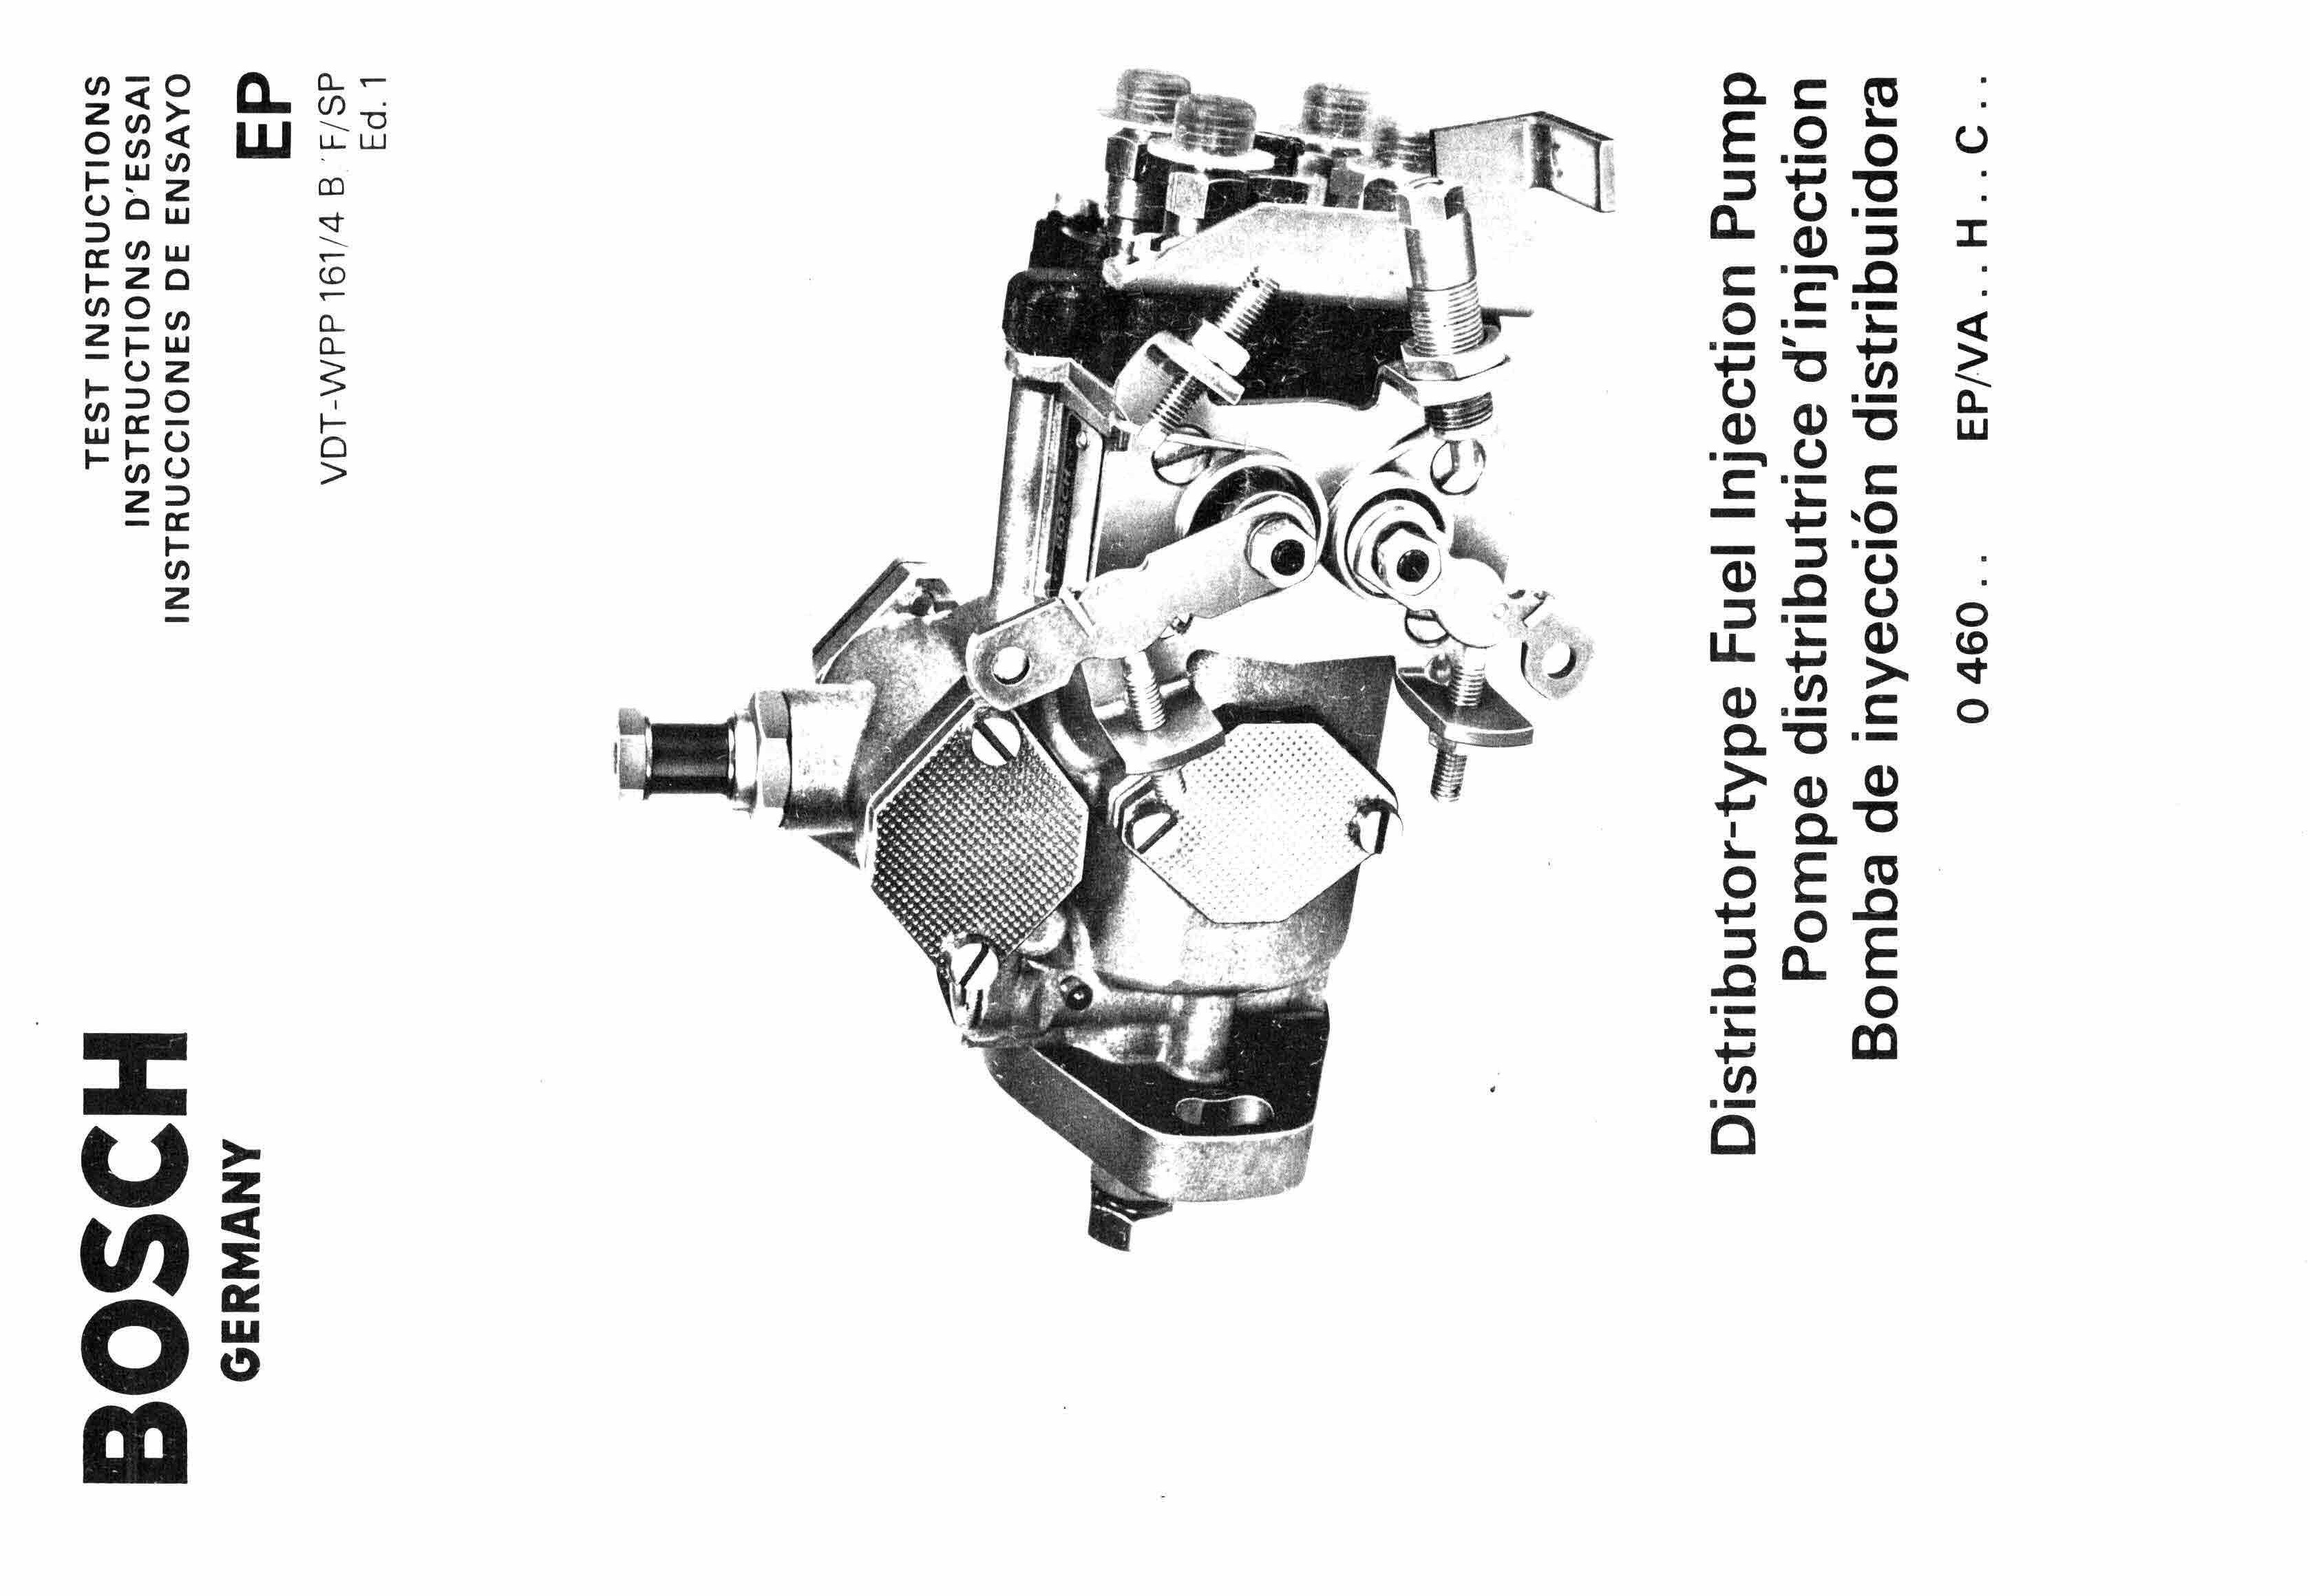 bosch diesel fuel pump manuals for mechanics rh sellfy com Bosch Injection Pump Parts Illustration Bosch Injection Pump Parts Illustration